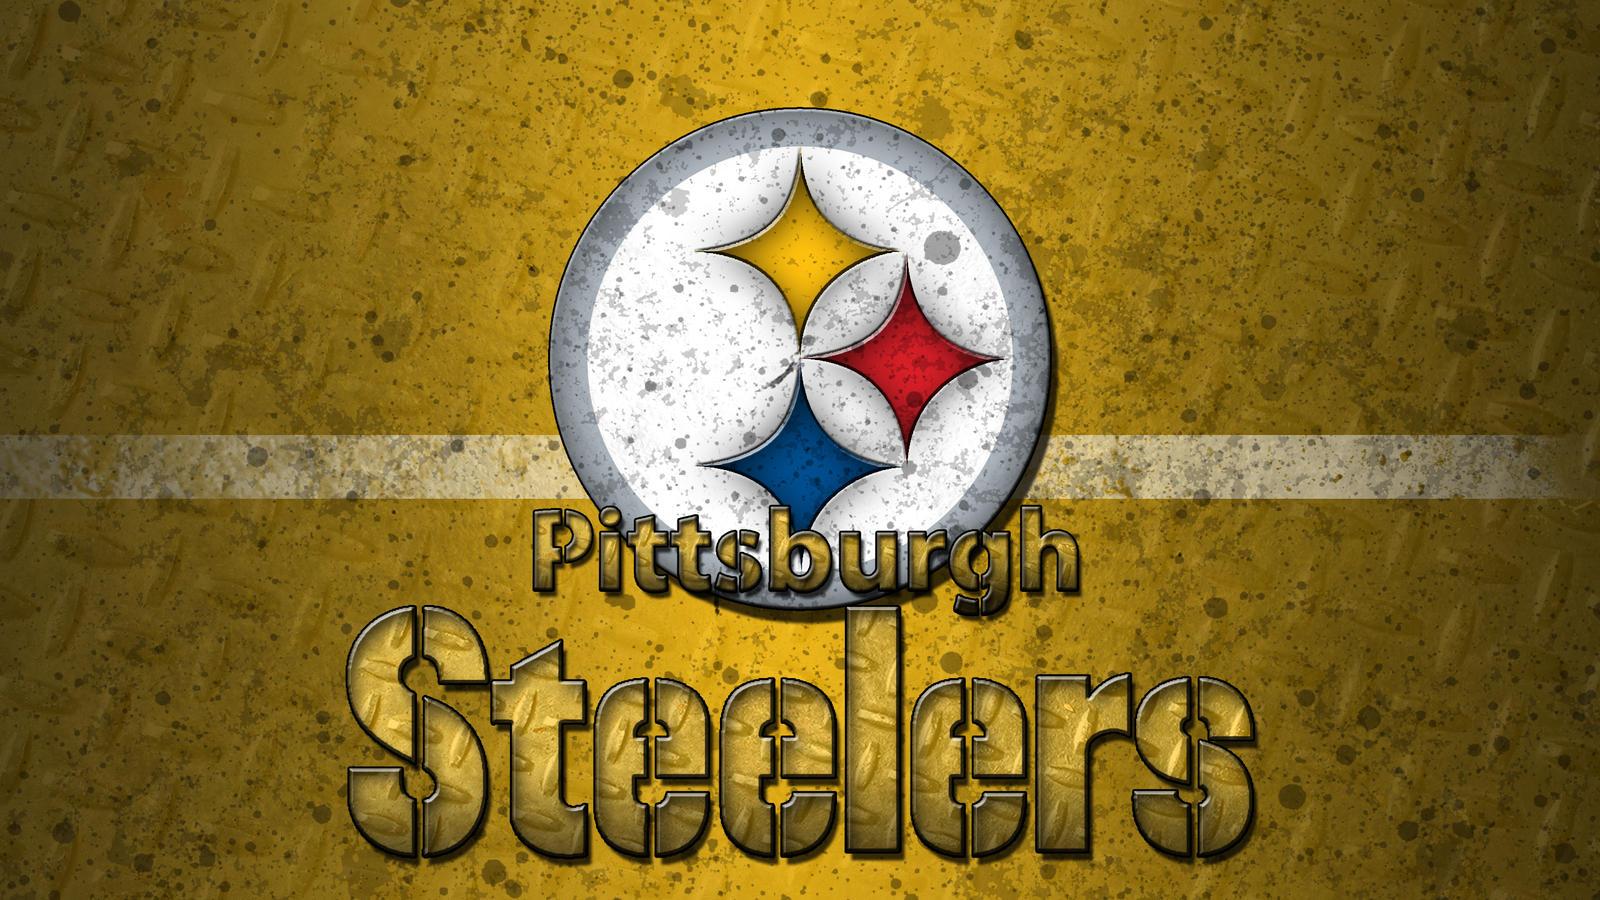 Pittsburgh Steelers By Beaware8 On Deviantart